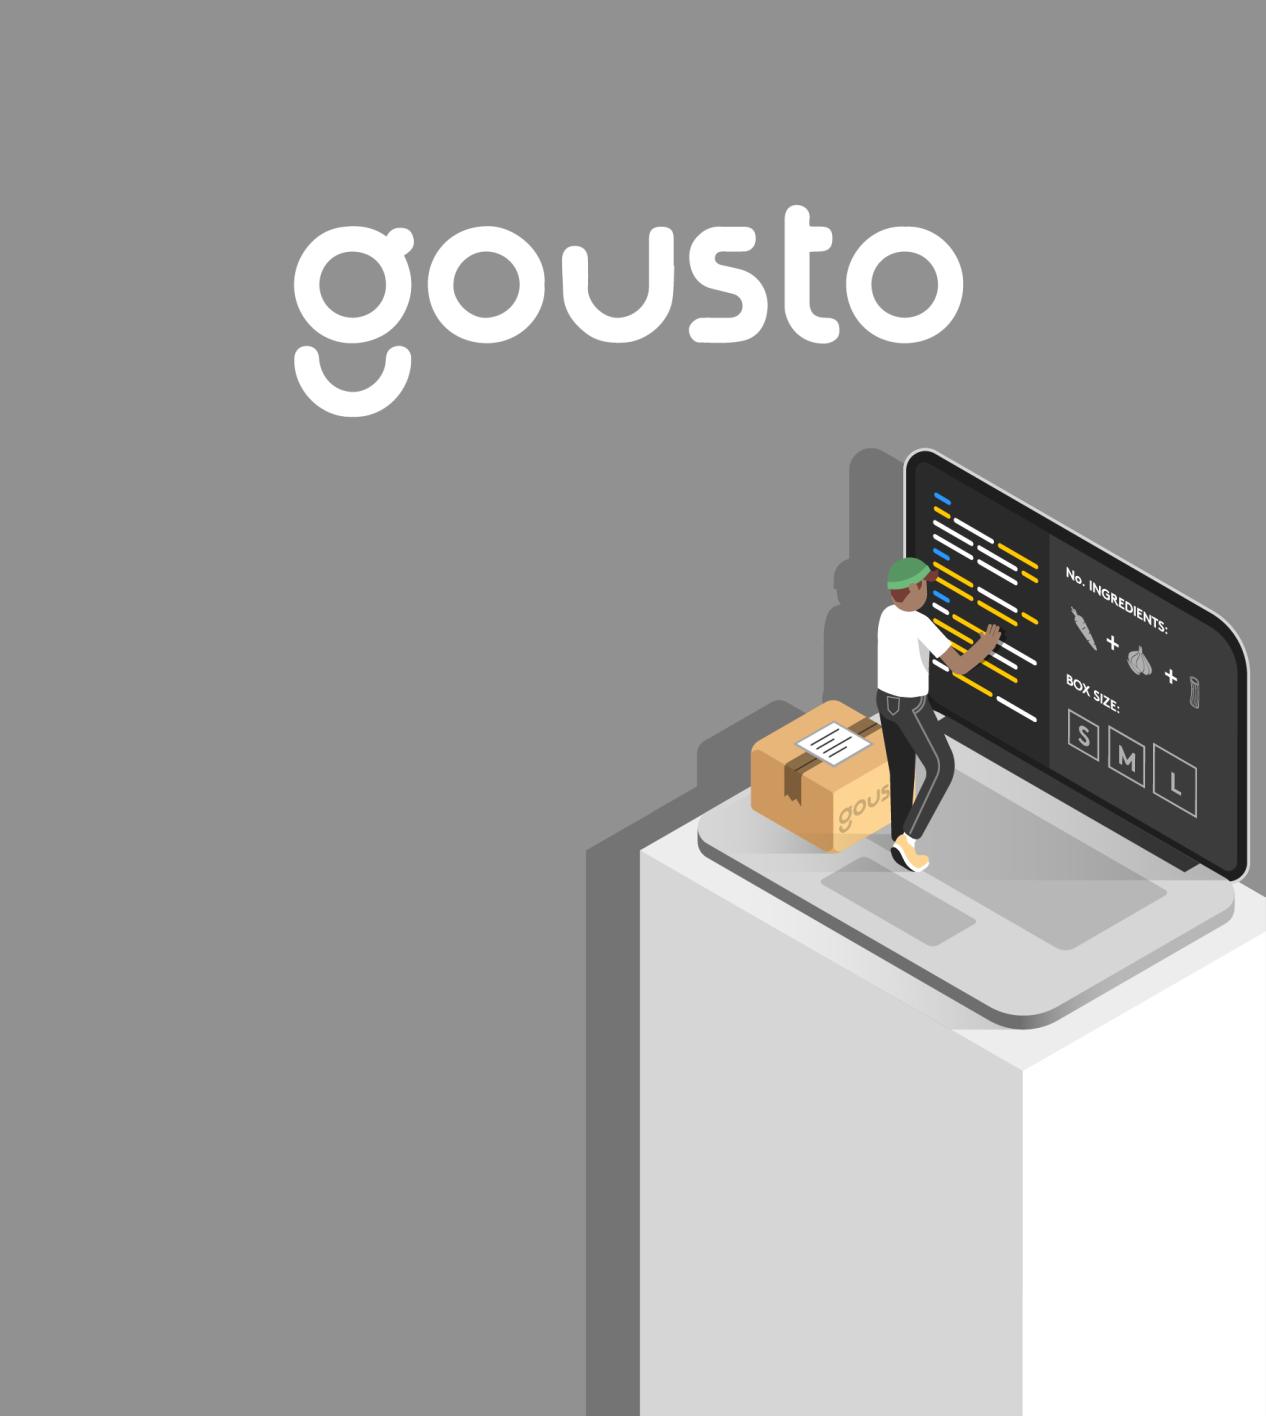 Gousto_hero_illustration_card-3